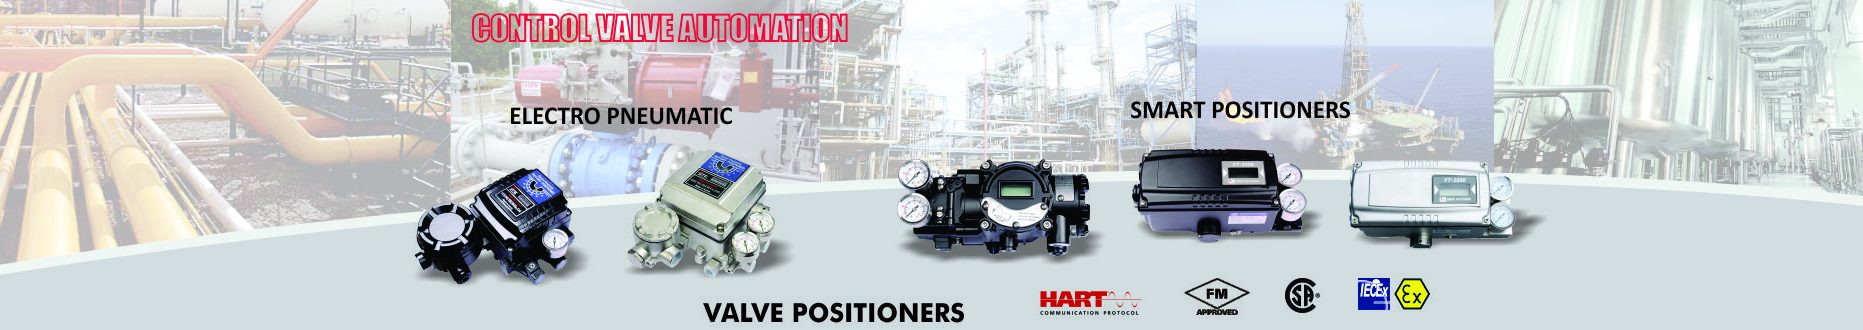 Valve Positioner (YTC), YT-3300 and YT-3400